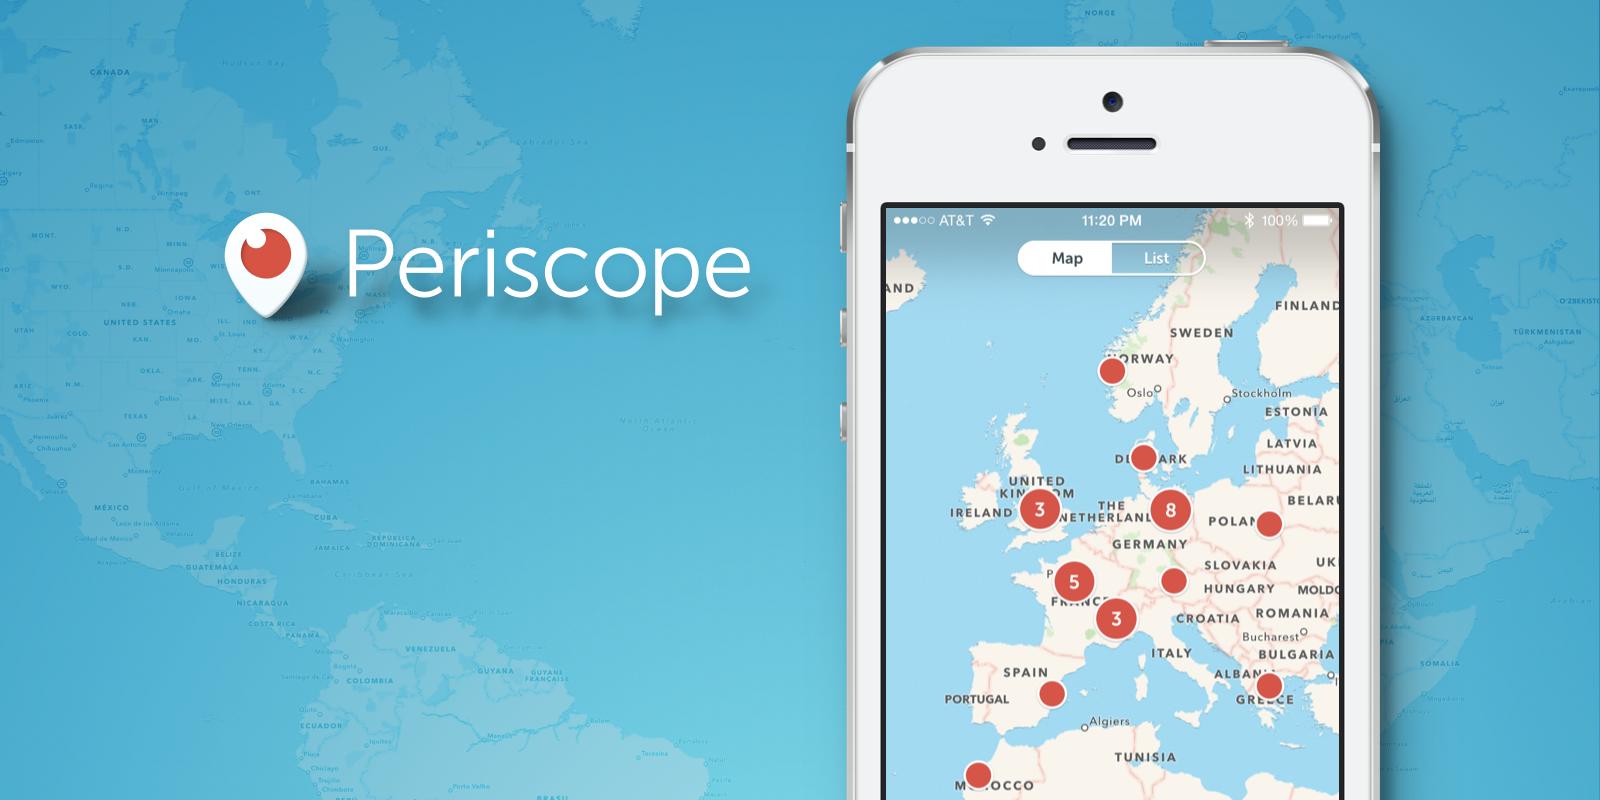 Twitter выкатывает новую кнопку сервиса Periscope в своем iOS клиенте